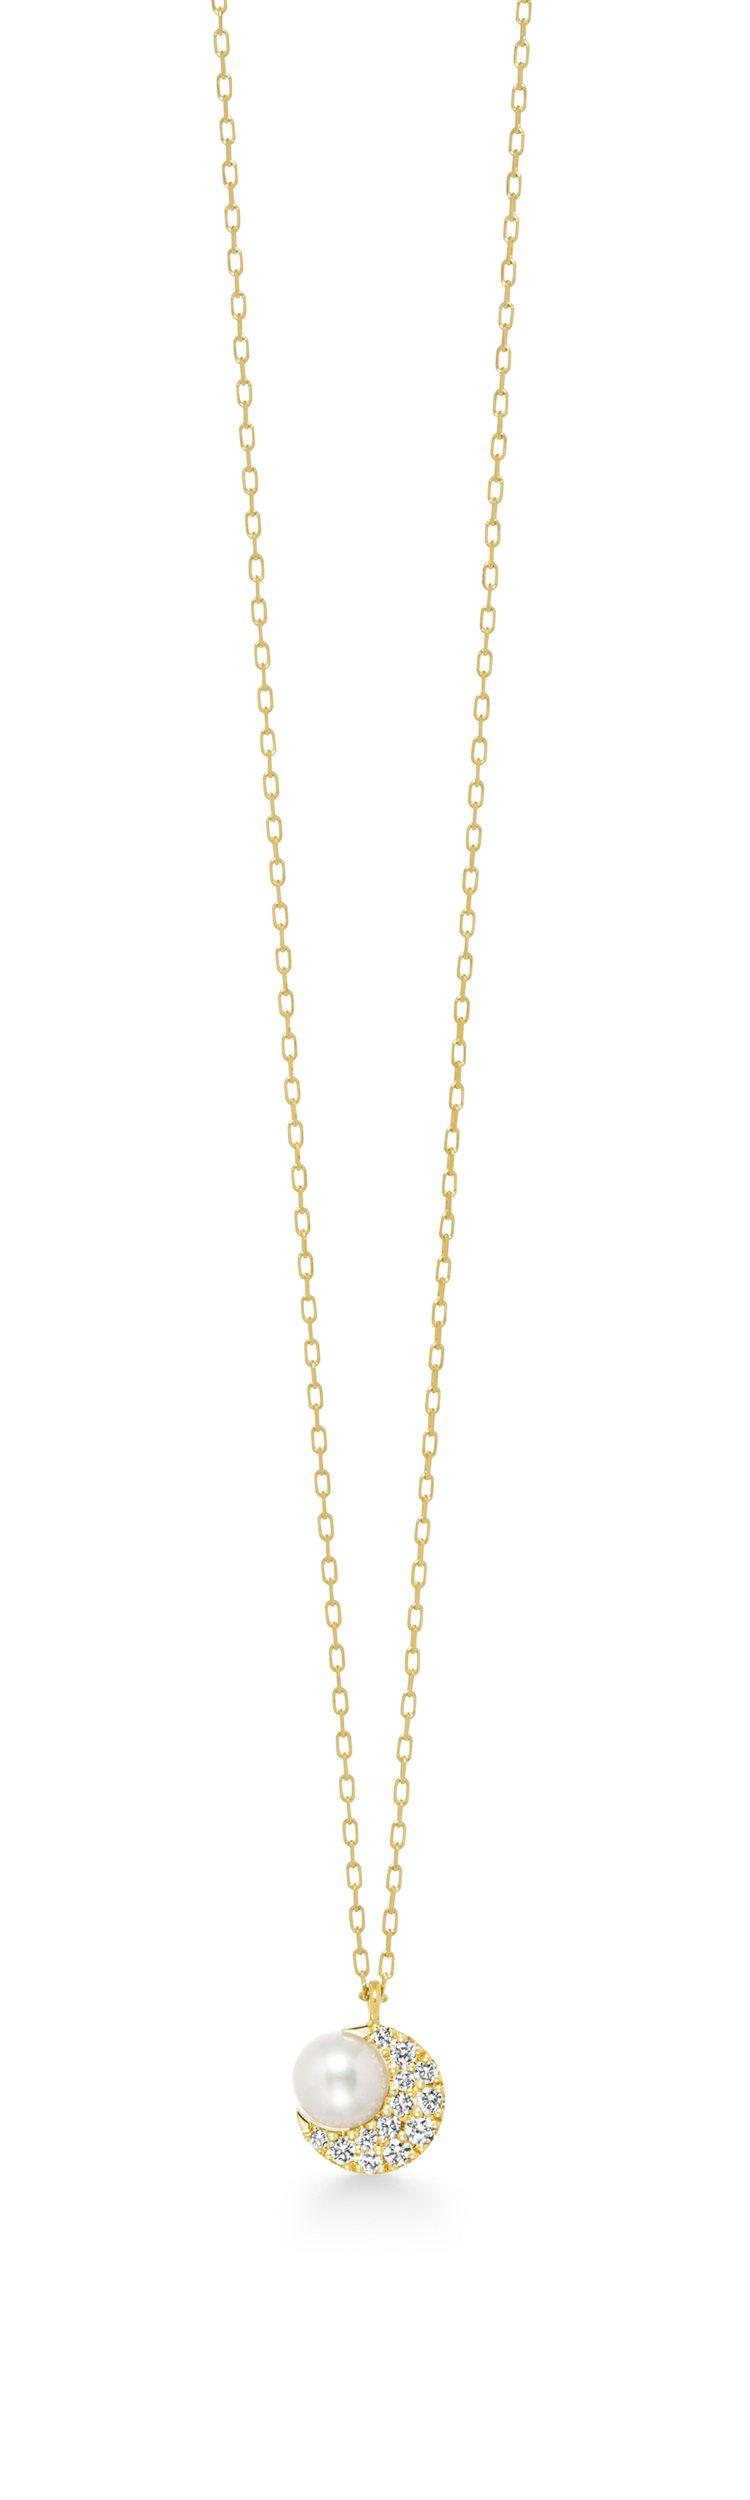 AHKAH crescent pearl pave 18K黃金鑽石珍珠項鍊,21...